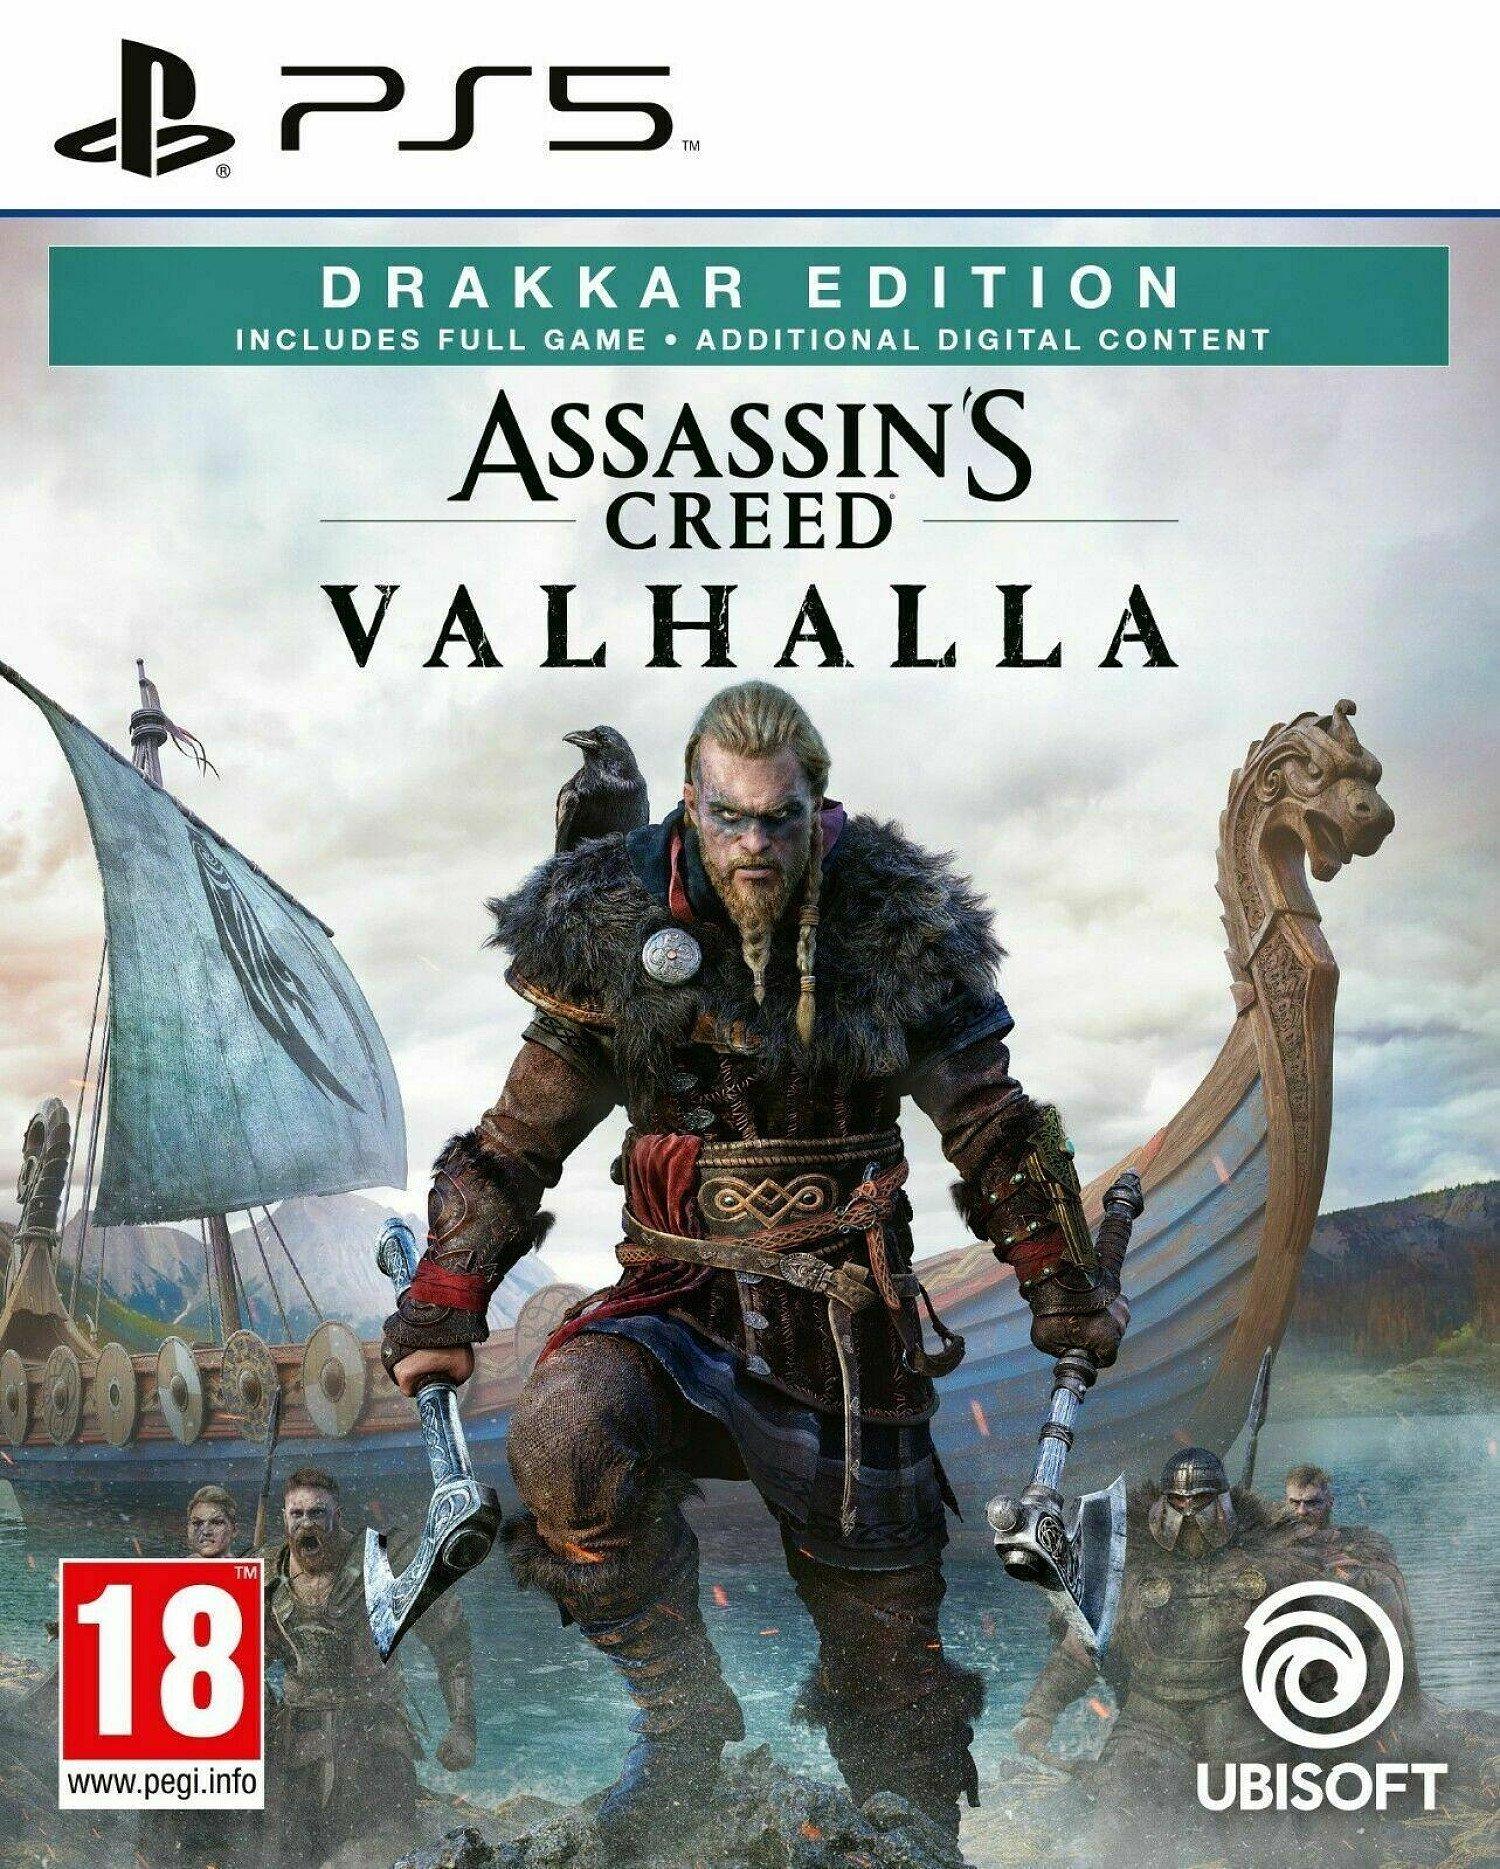 Playstation 5 ********'s Creed Valhalla Drakkar Edition (PS5) BRAND NEW